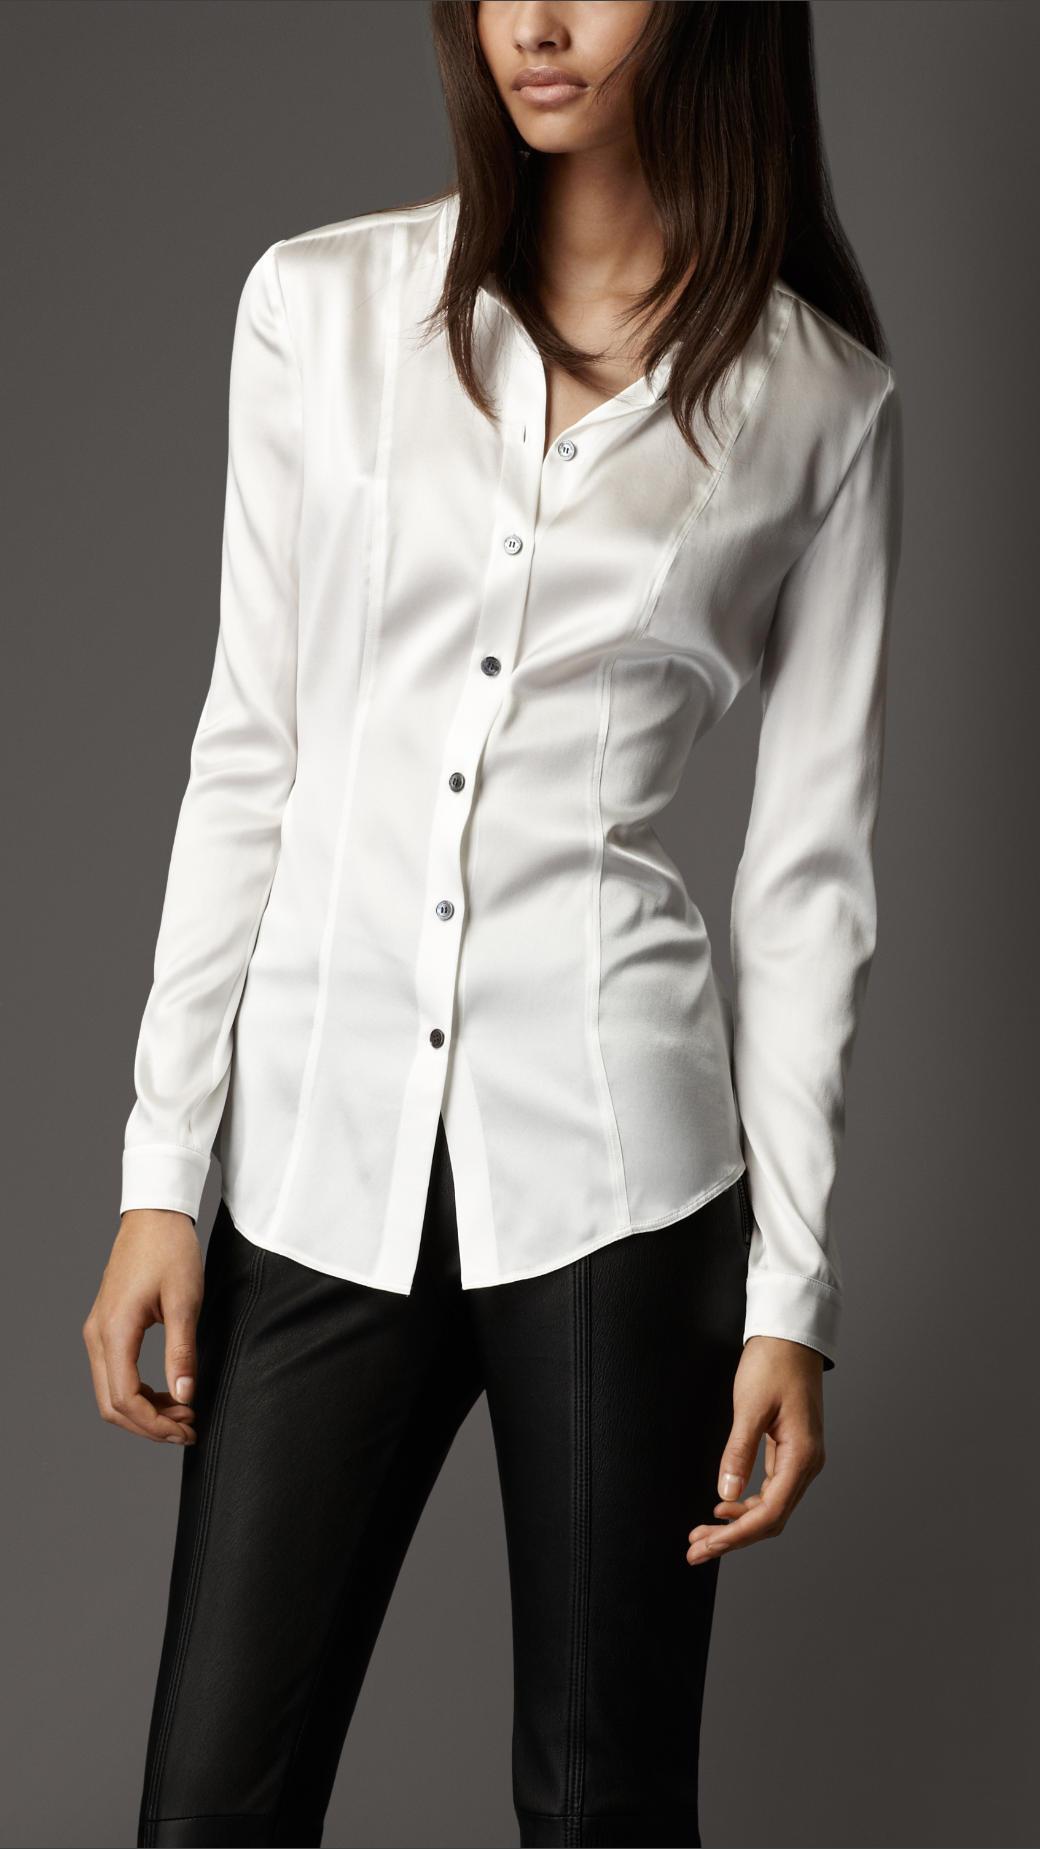 Prada Shirts For Women